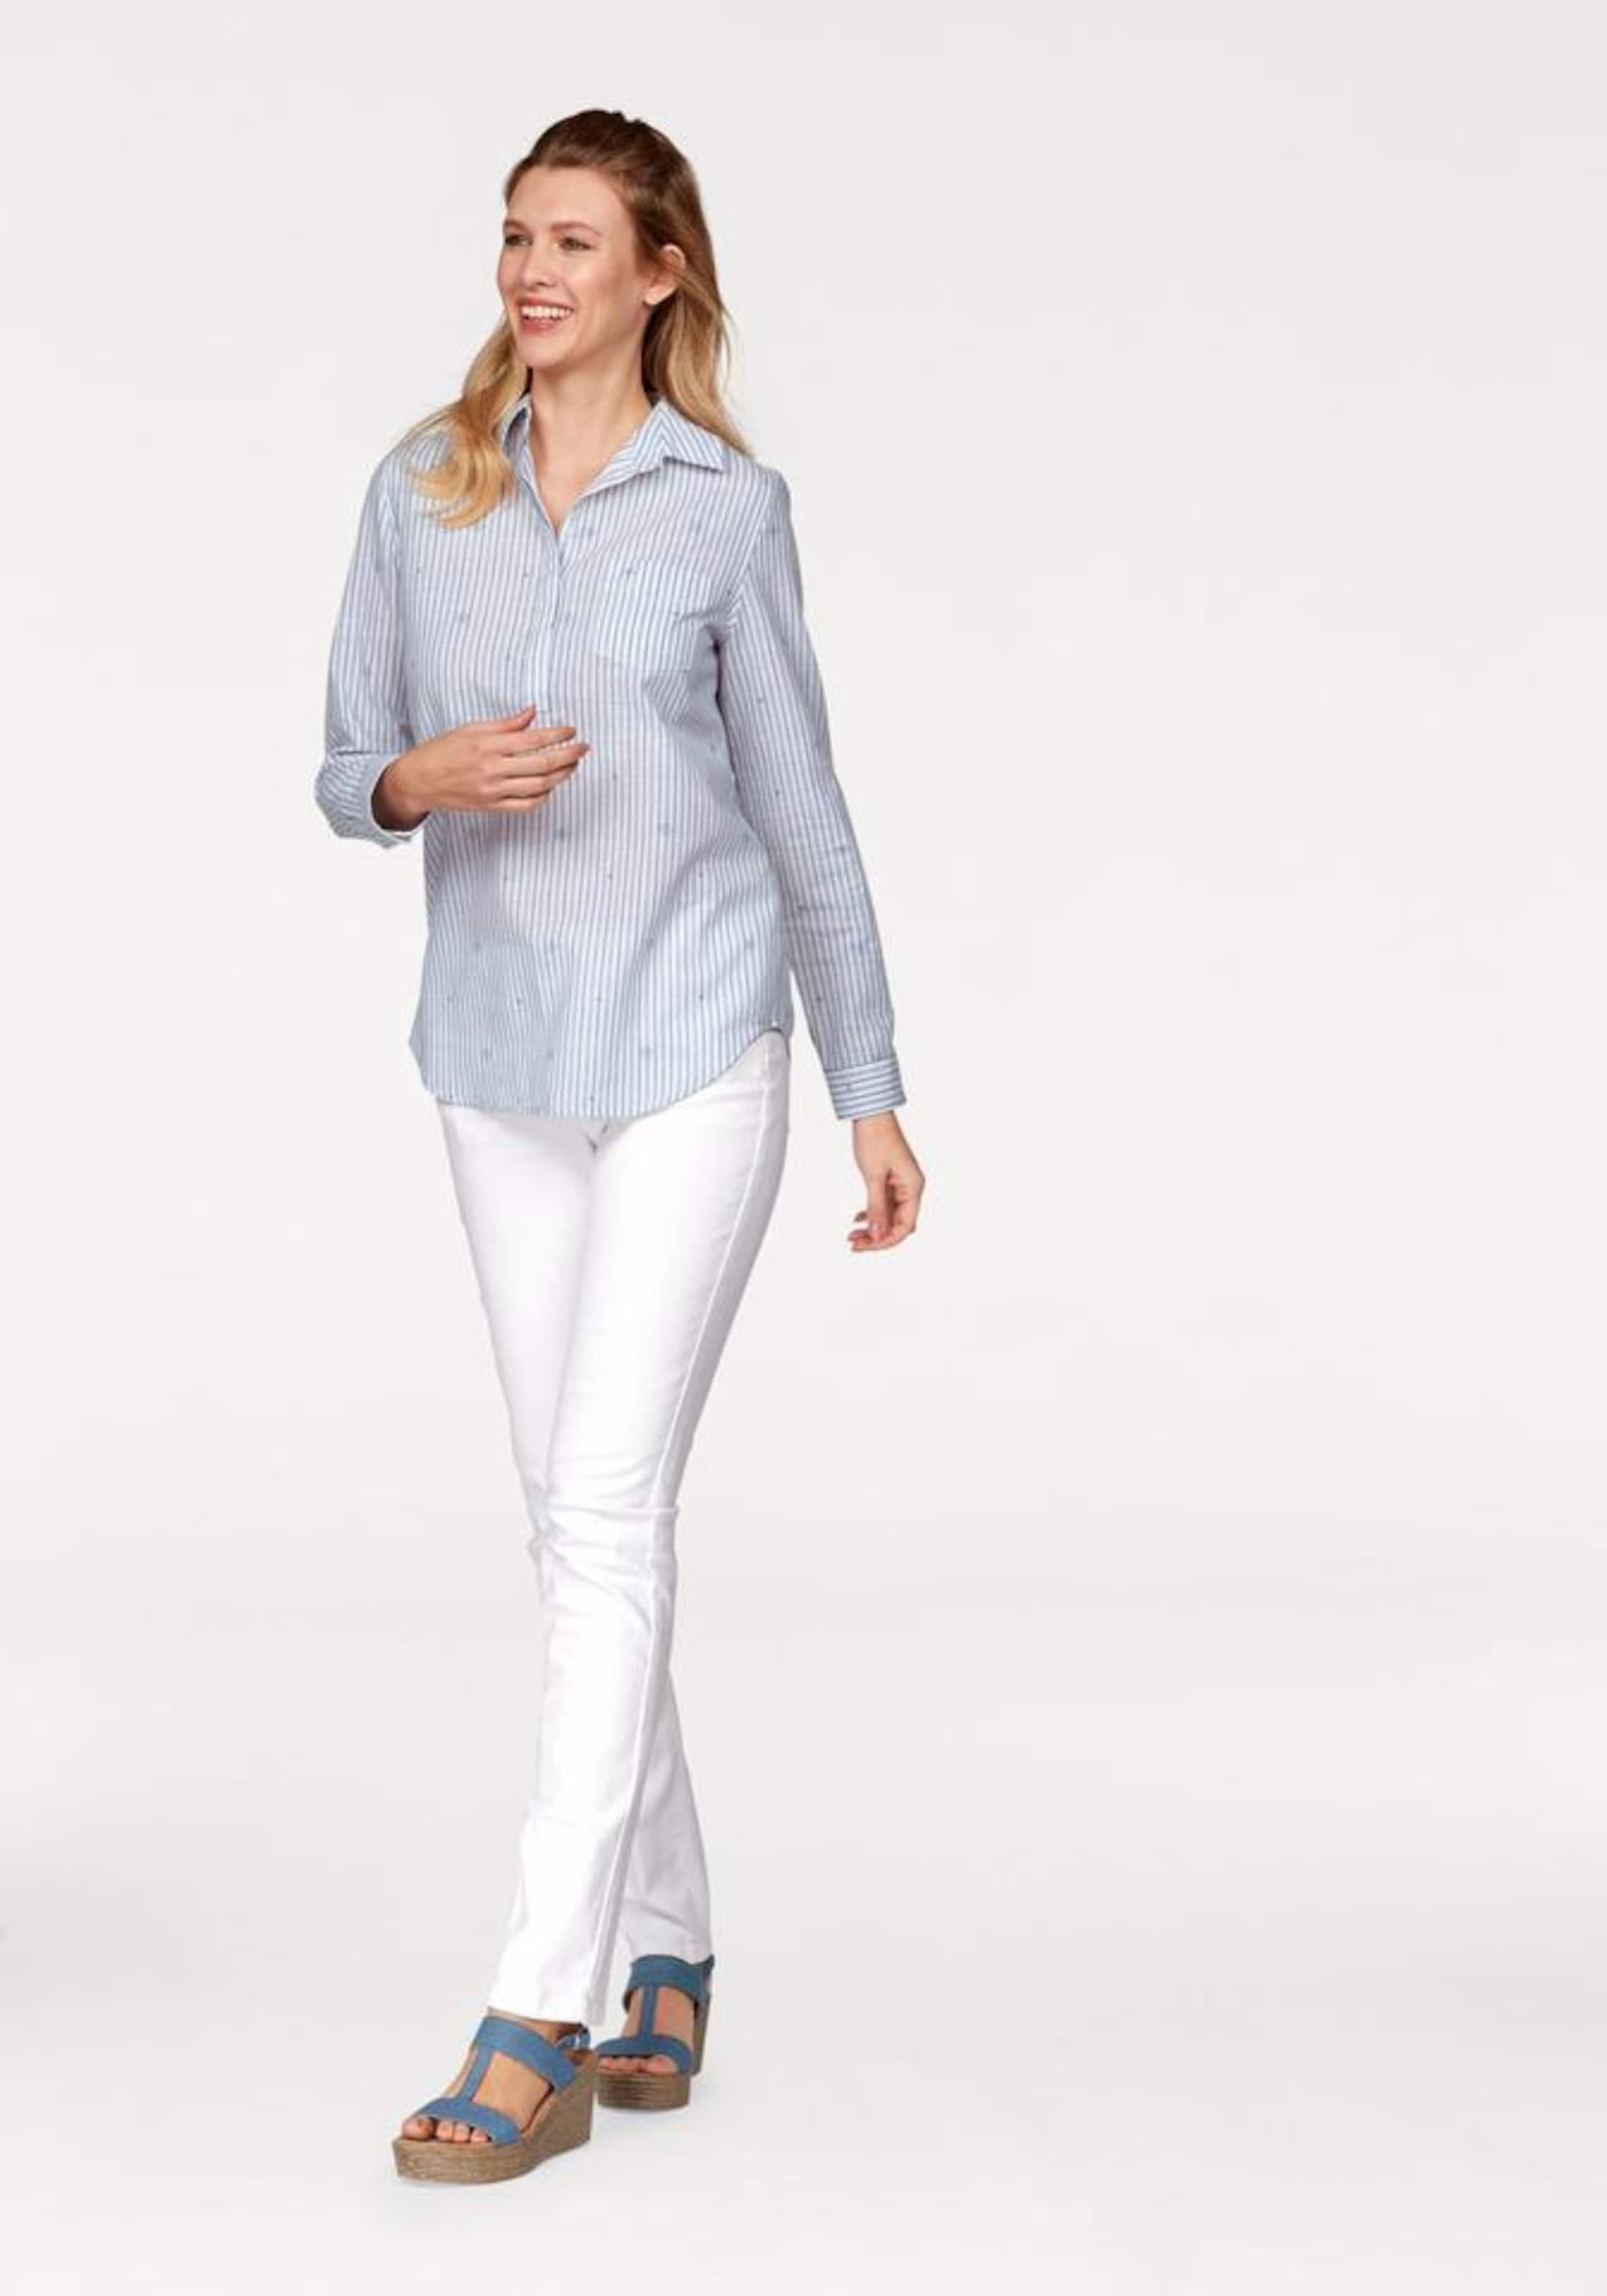 CHEER Slim-fit-Jeans Vorbestellung Online Rabatt-Outlet-Store n8SAPhA55